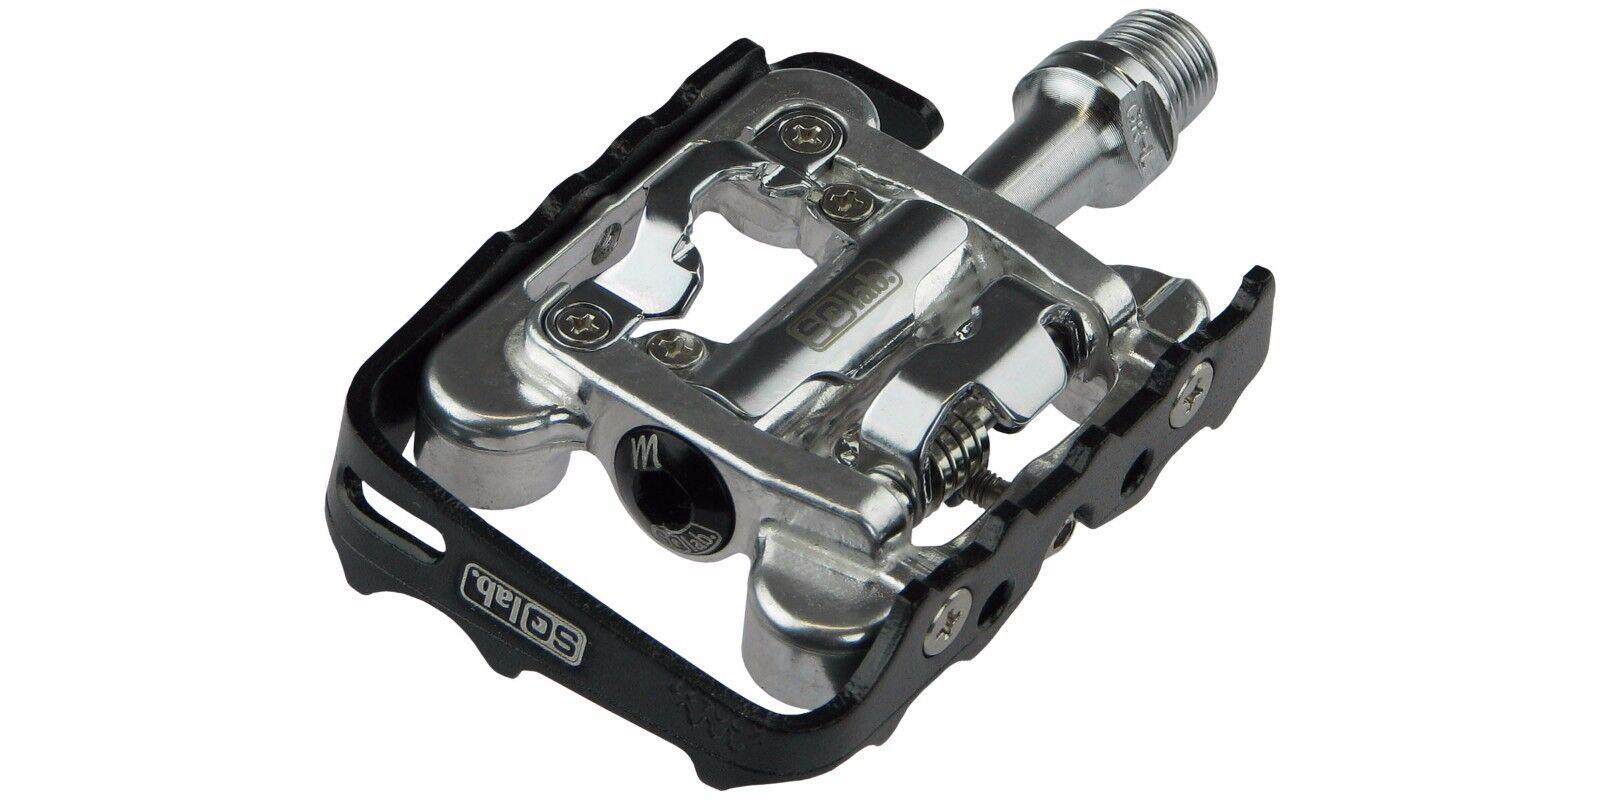 Sq Lab 502 MTB + trekking pedales Alu clickpedale bicicleta MTB nuevo